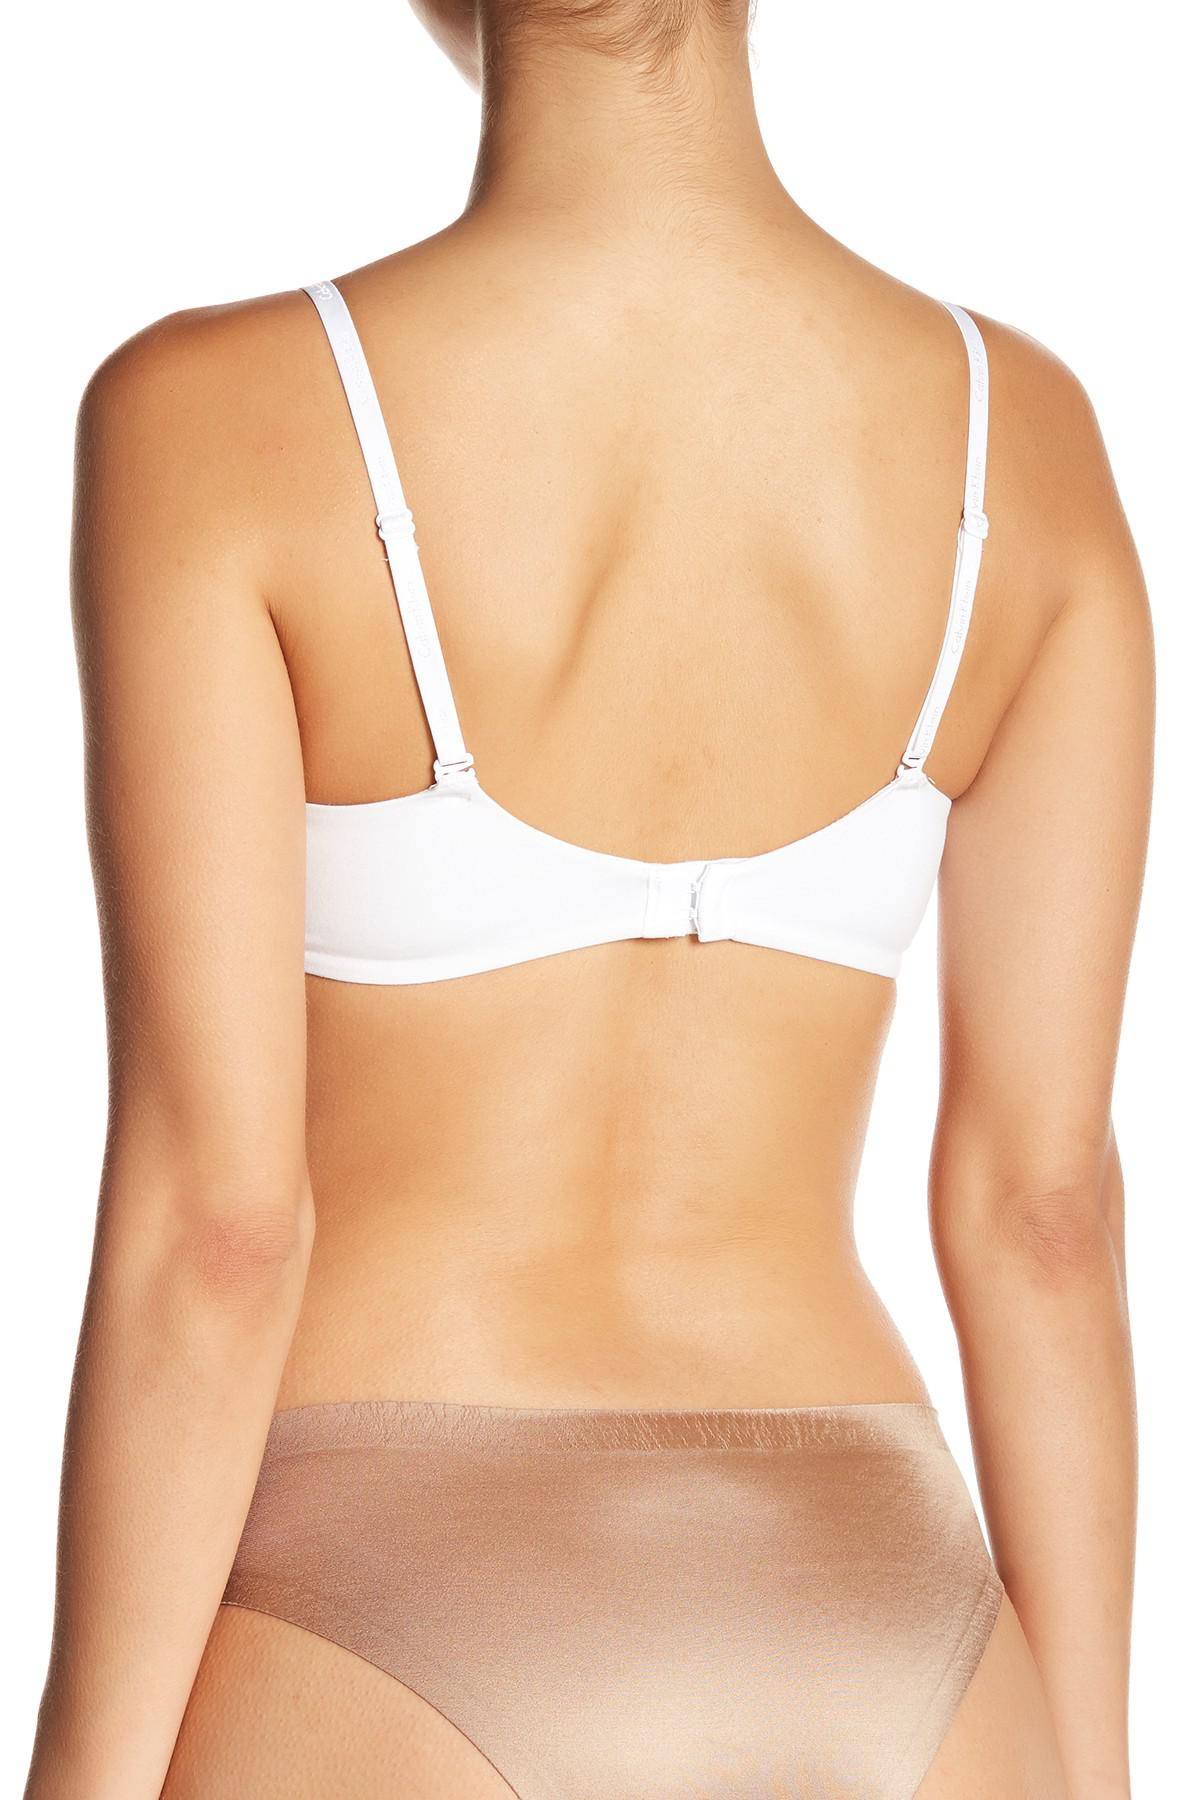 2b35f12b0b6e0 Calvin Klein - White Constant Plunge Push-up Bra - Lyst. View fullscreen